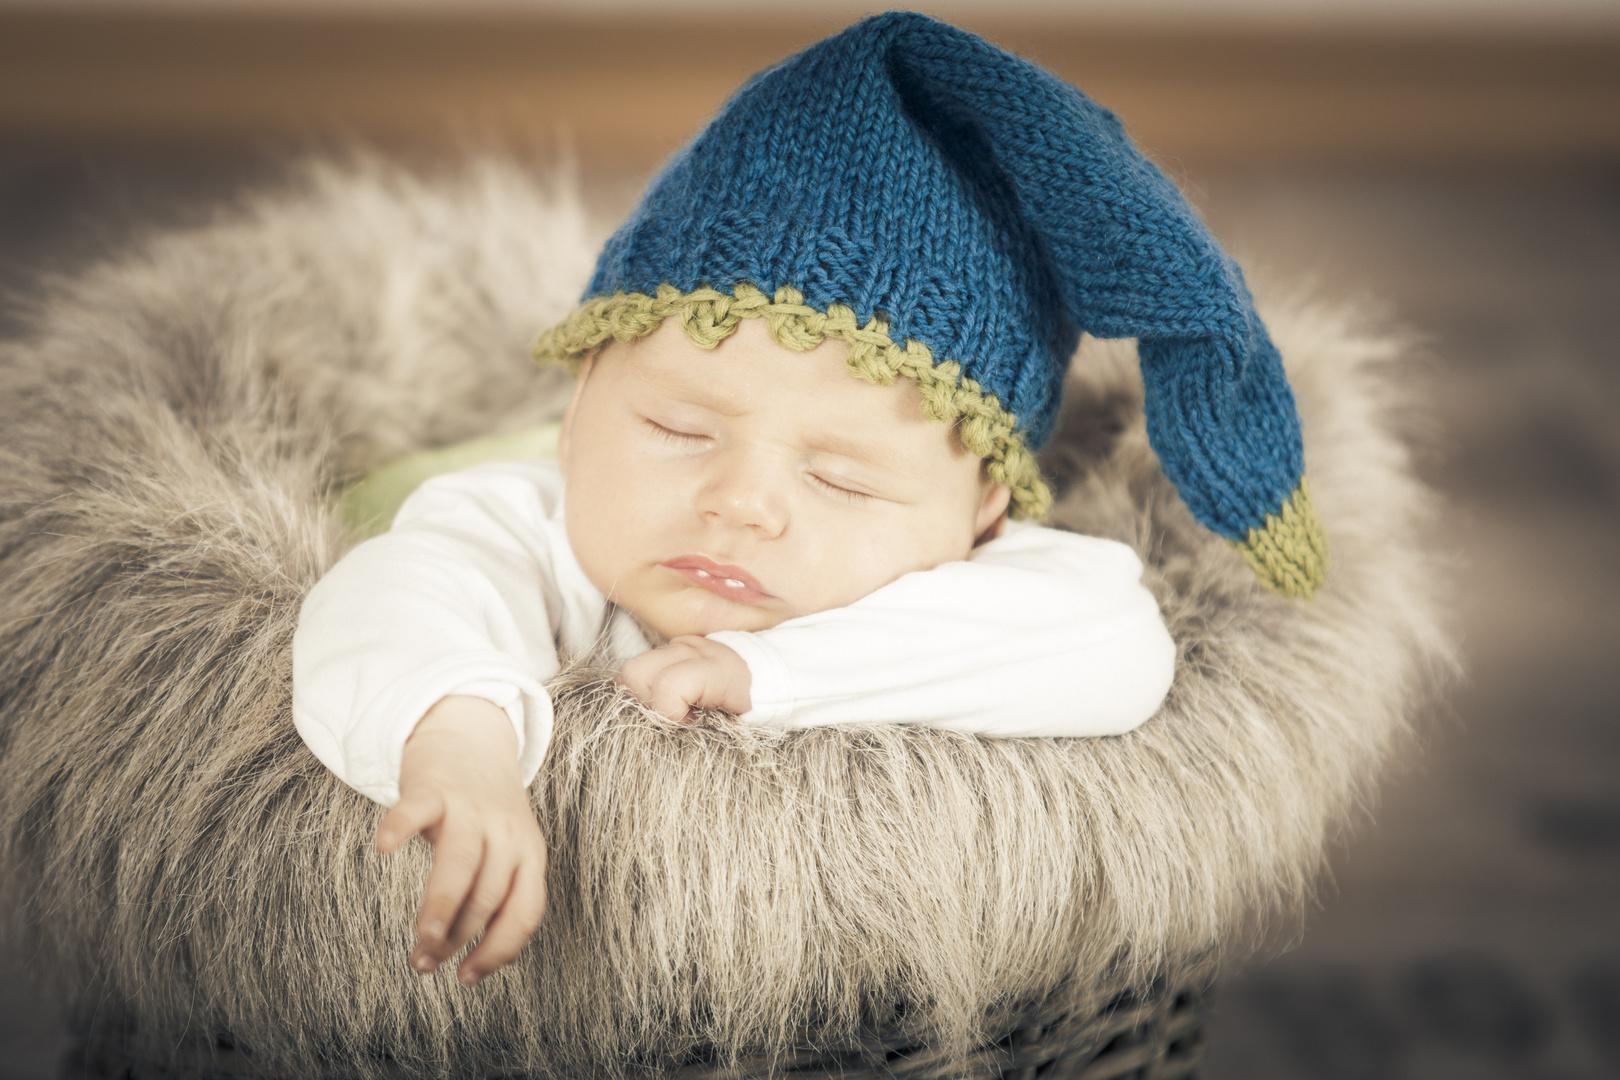 Schlaf, Kindlein schlaf ...